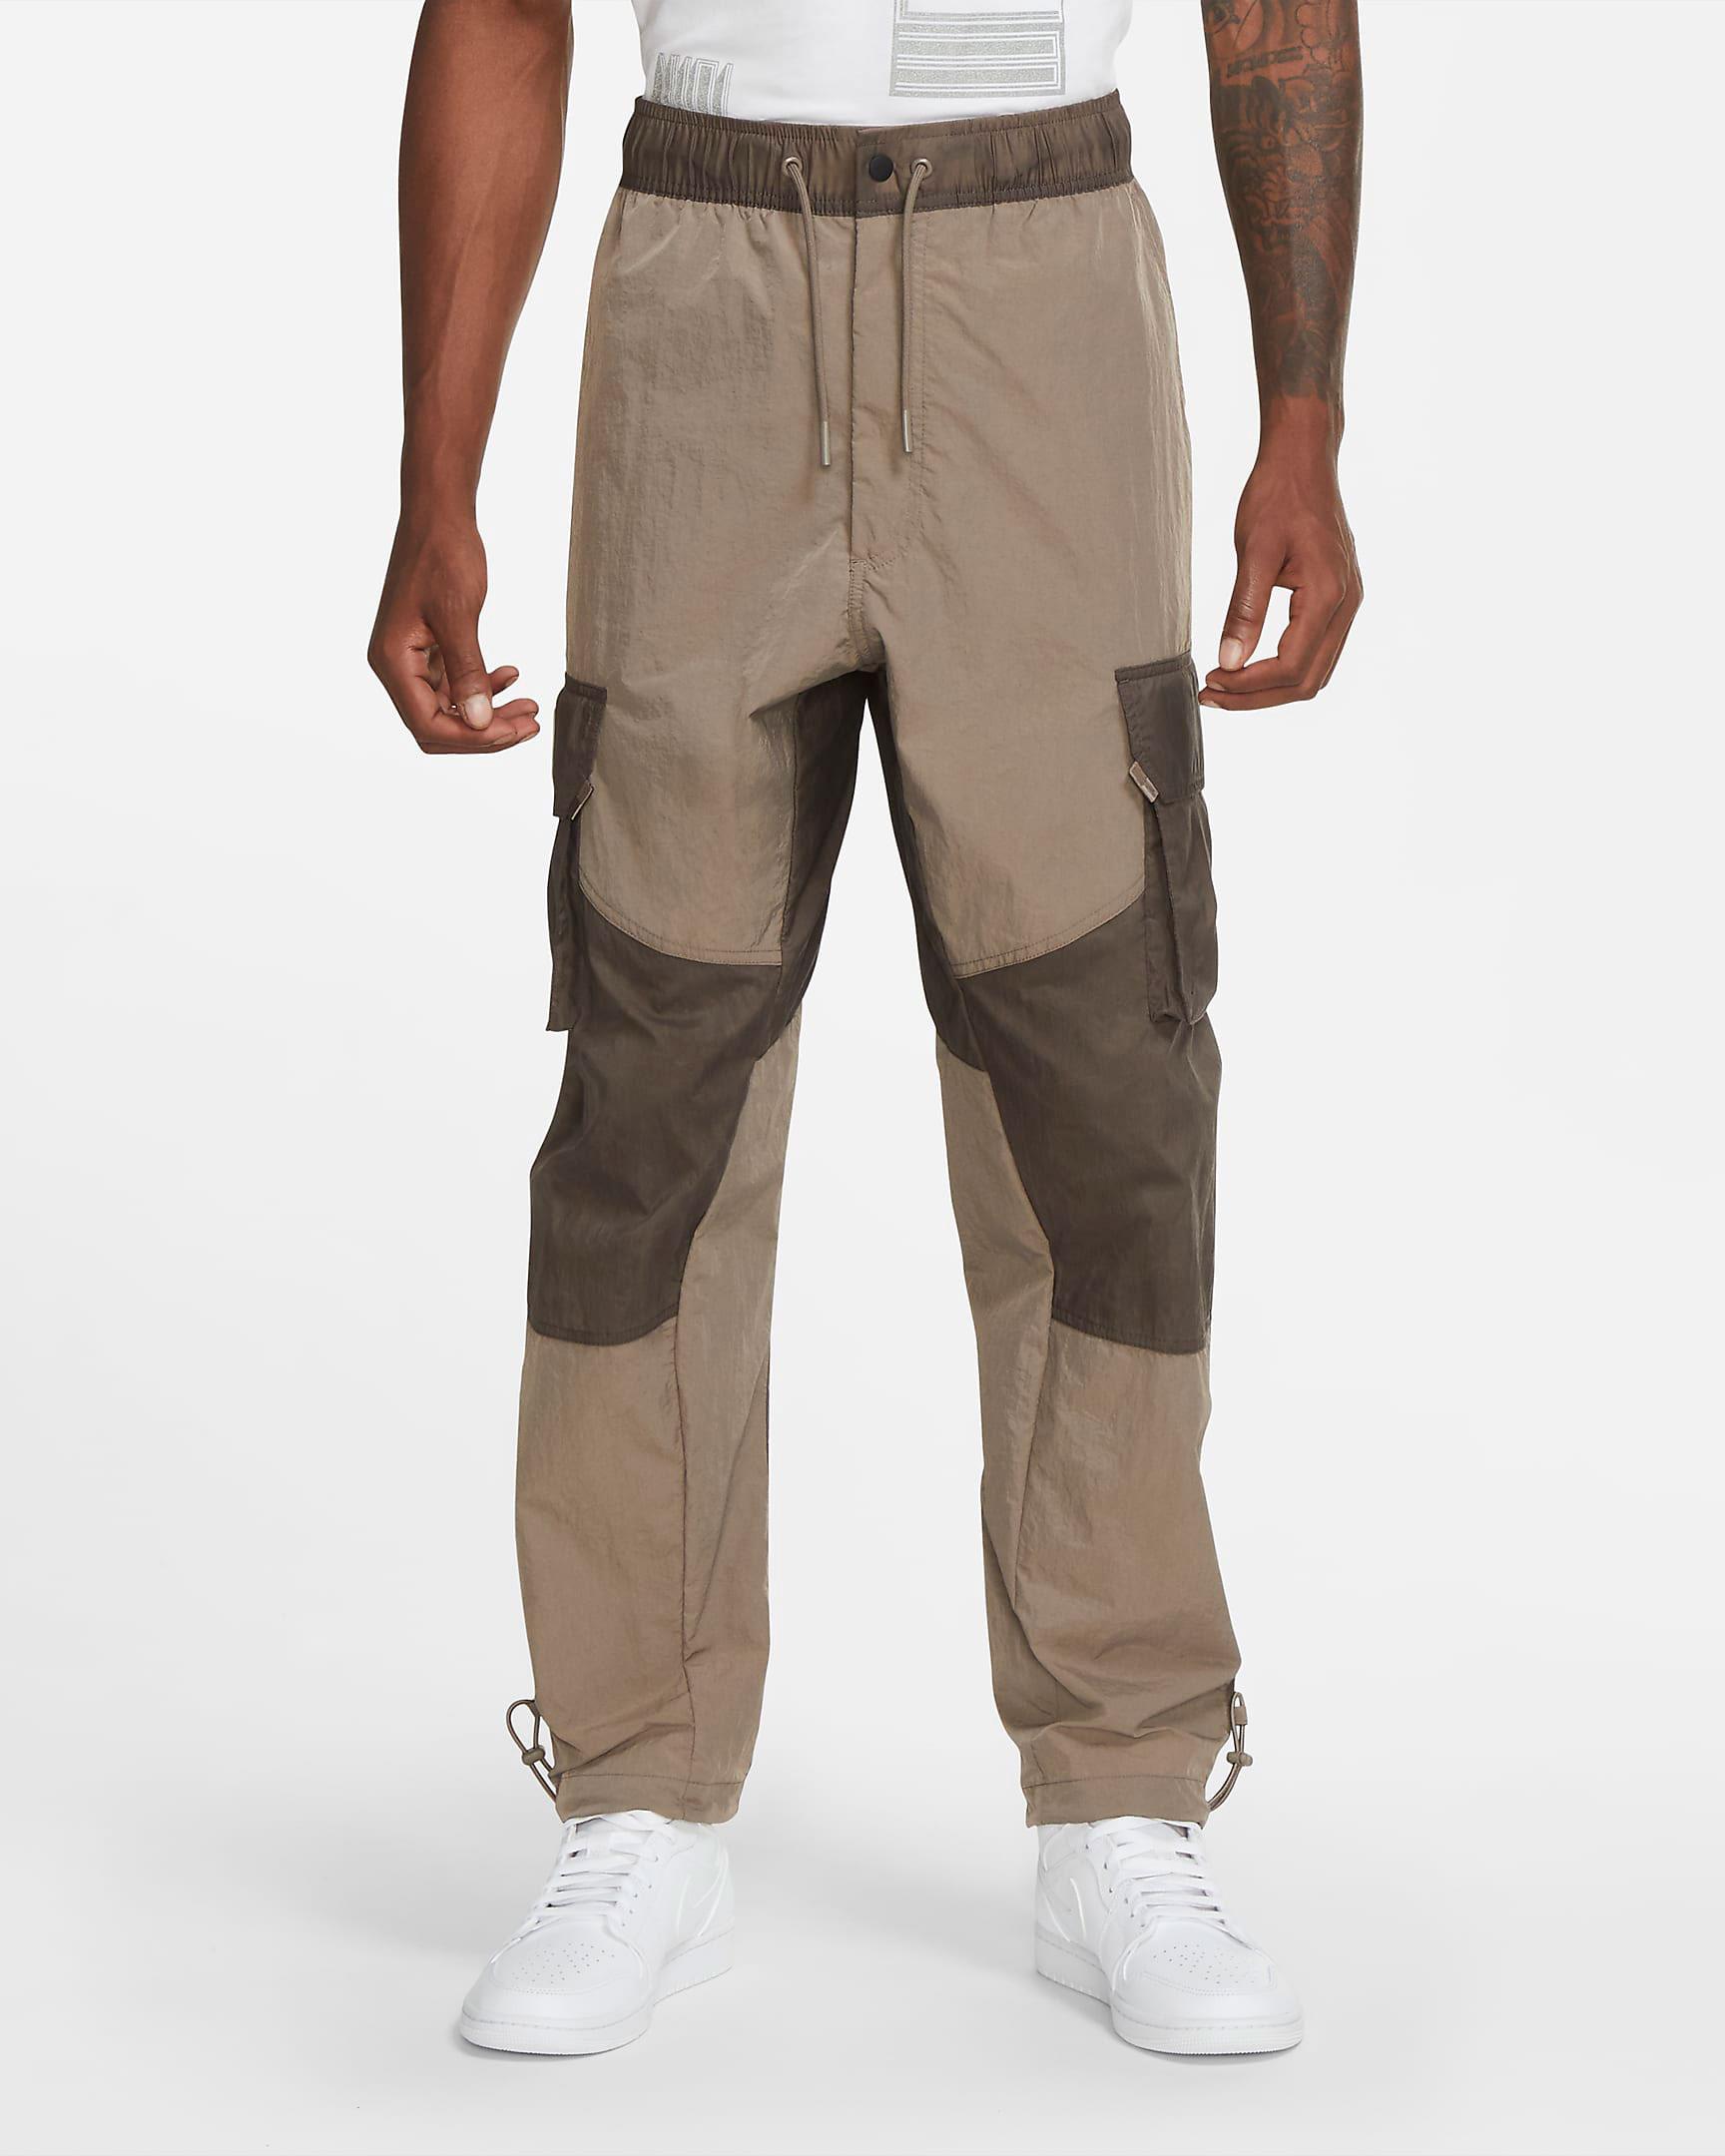 jordan-1-dark-mocha-cargo-pants-match-1